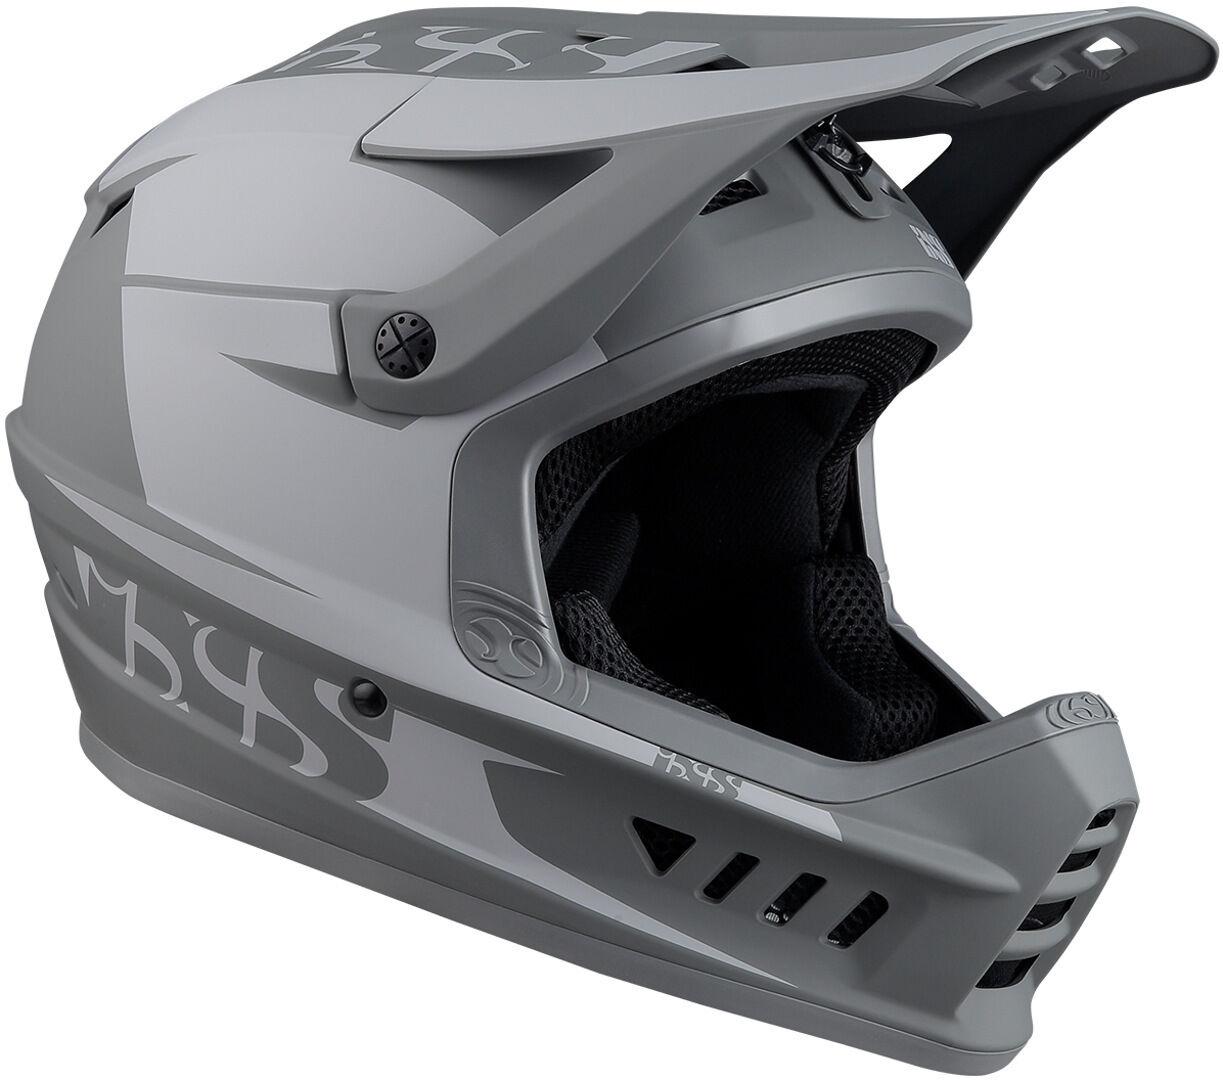 IXS XACT Evo Downhill Helmet  - Size: Large